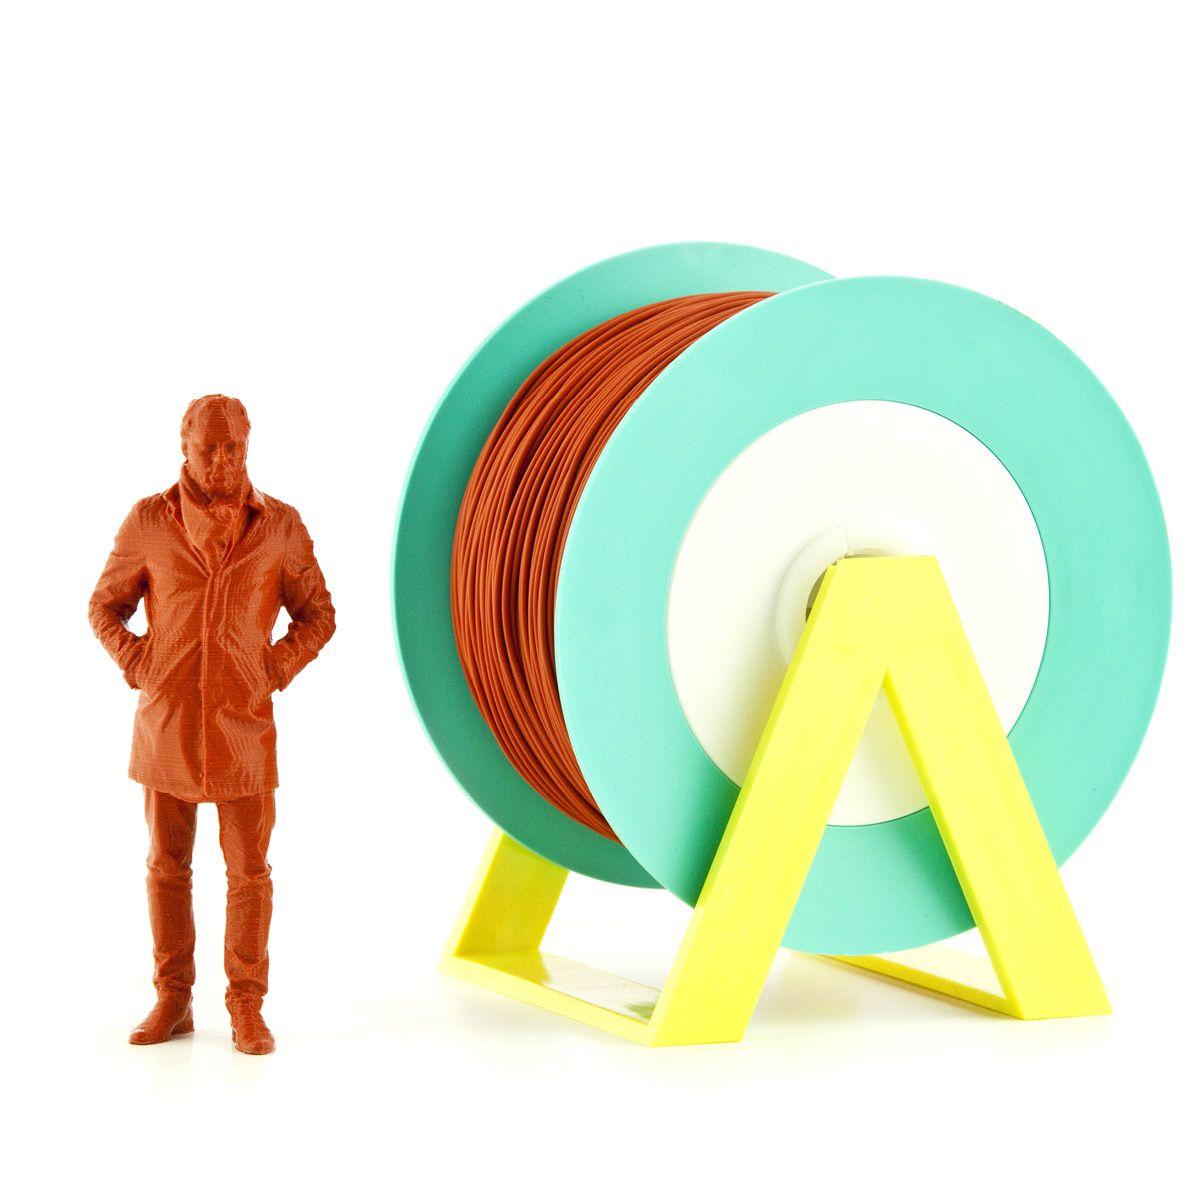 PLA Filament | Color: Orange Brick